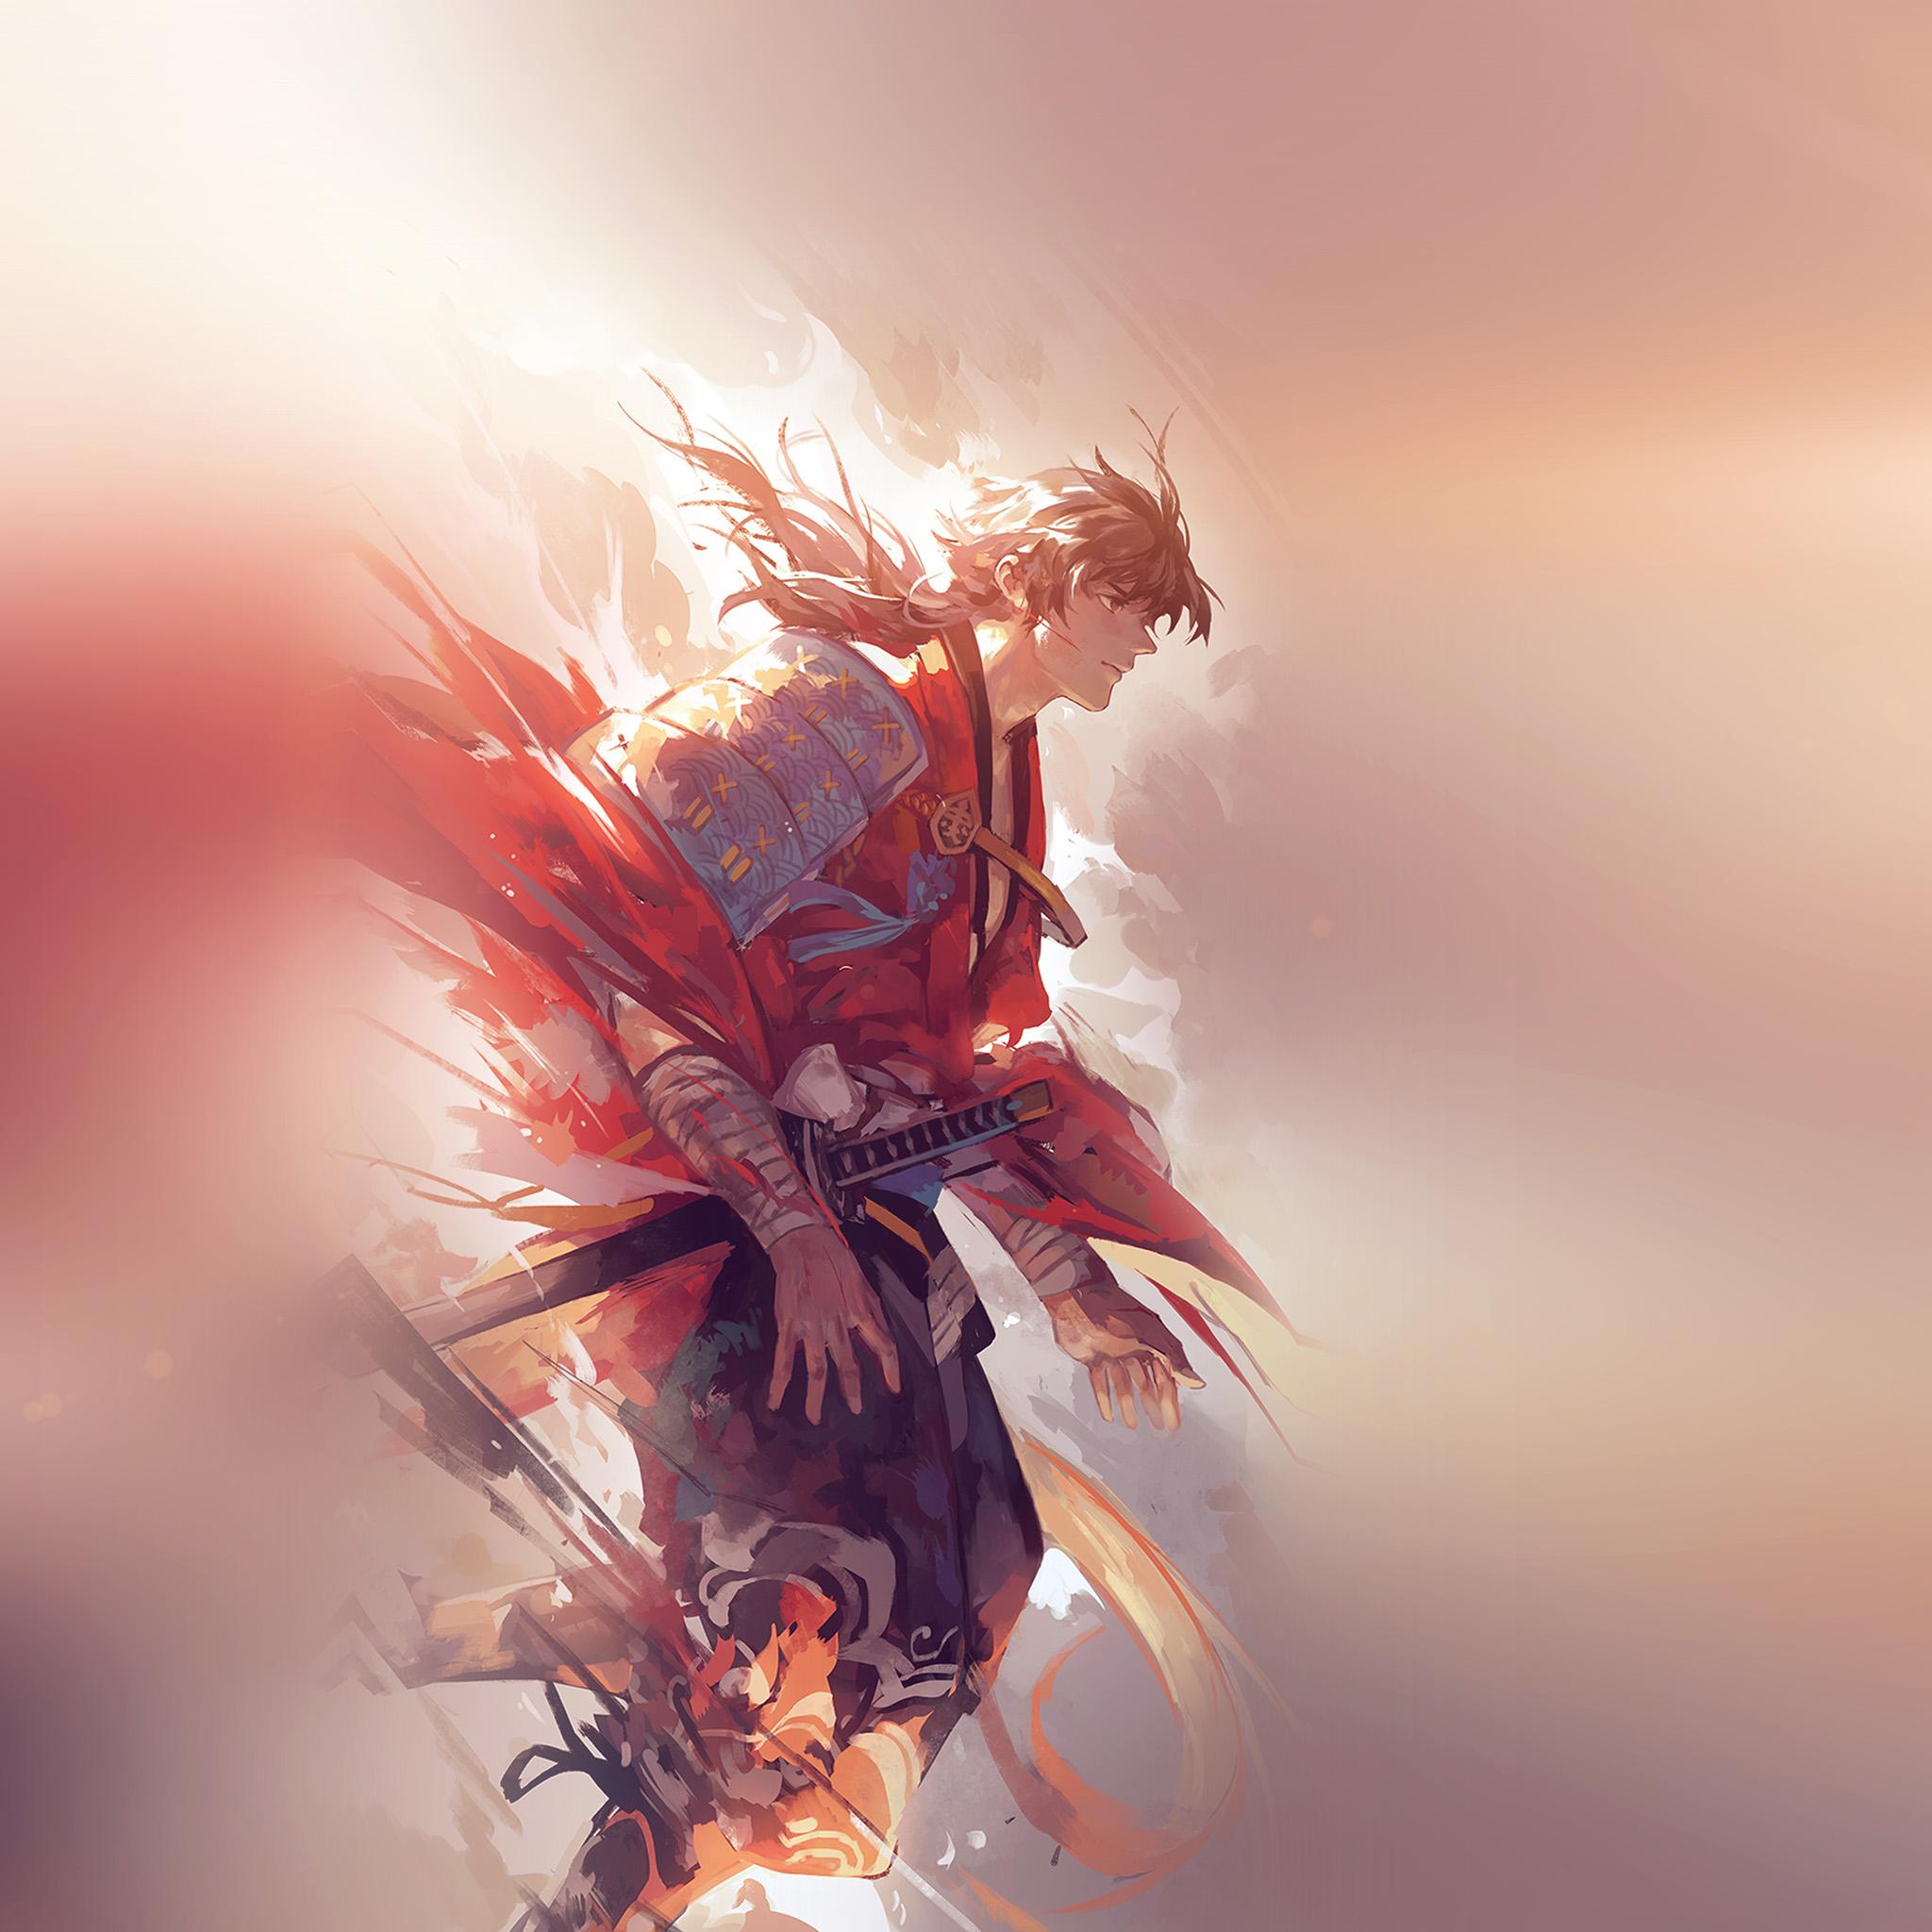 Aw64-hanyijie-hero-red-handsomeillustration-art-anime